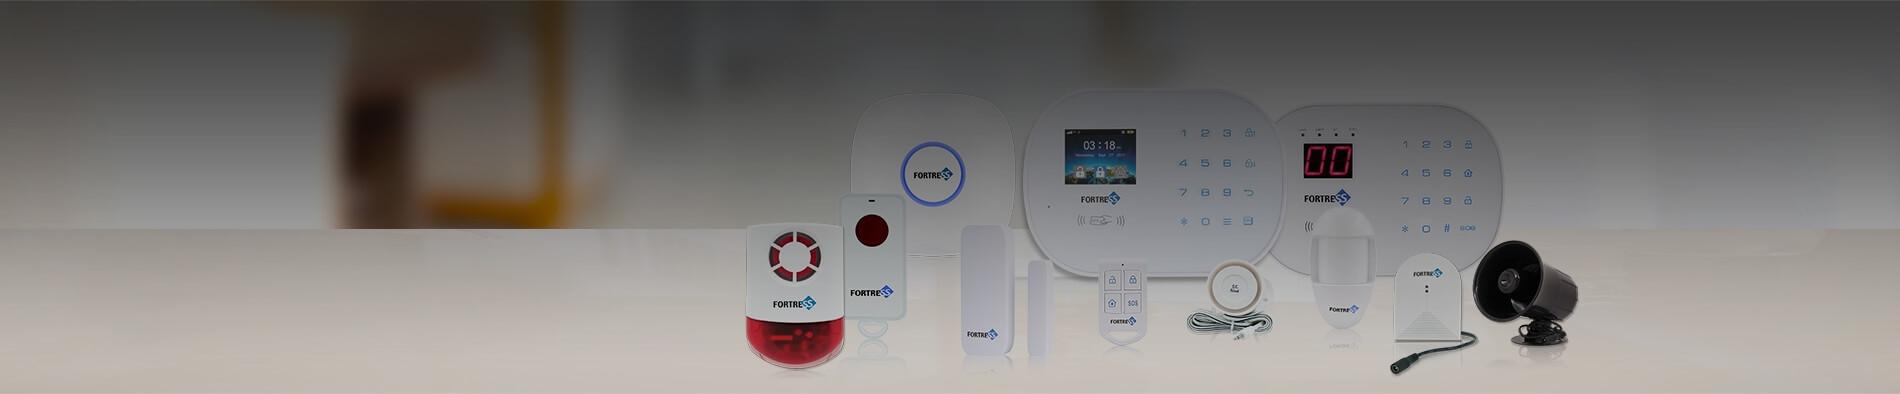 S6 Titan 3G/4G WiFi Security System